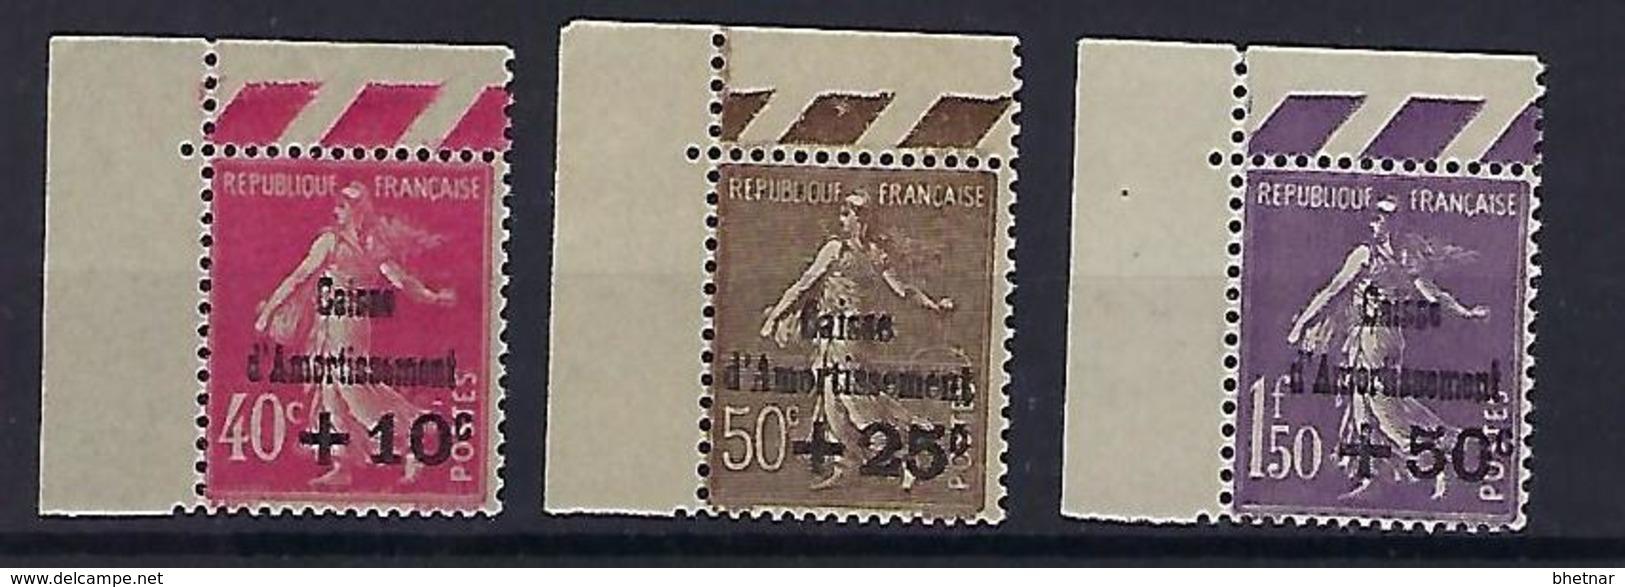 "FR YT 266 à 268 "" Caisse D'amortissement "" 1930 Neuf** BDF - Sinking Fund"